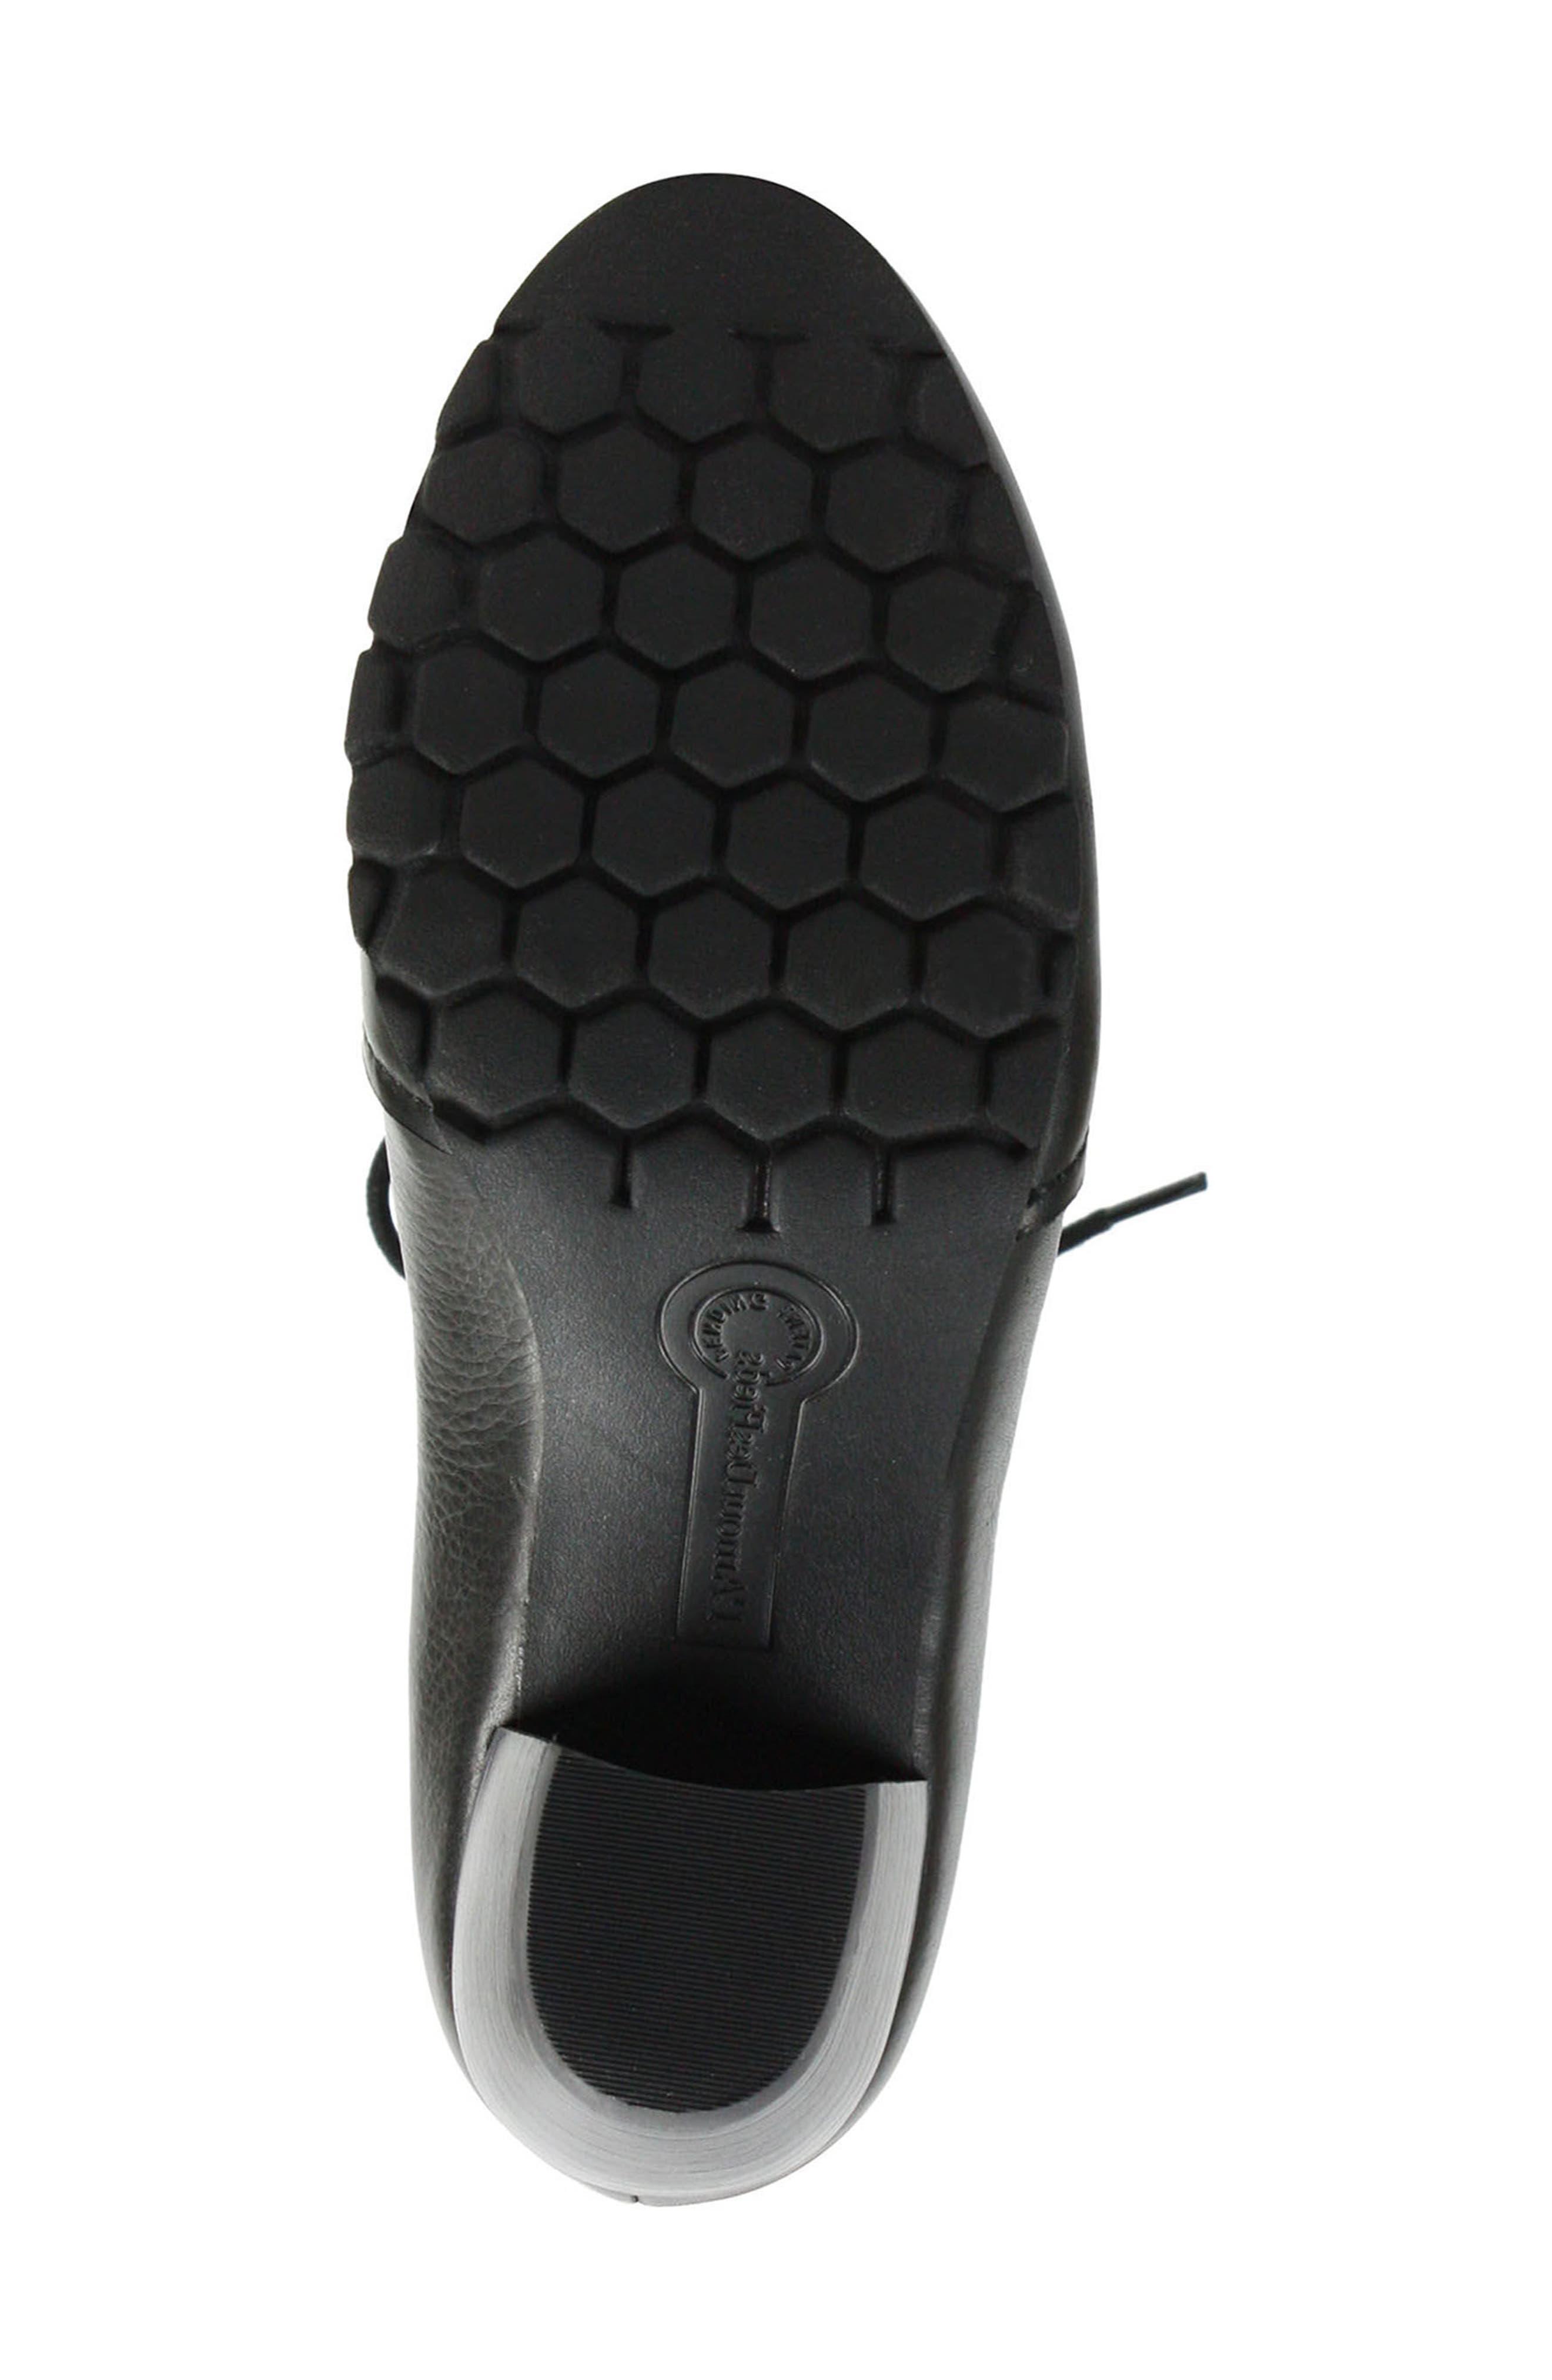 Pontedera Lace-Up Bootie,                             Alternate thumbnail 4, color,                             BLACK LEATHER